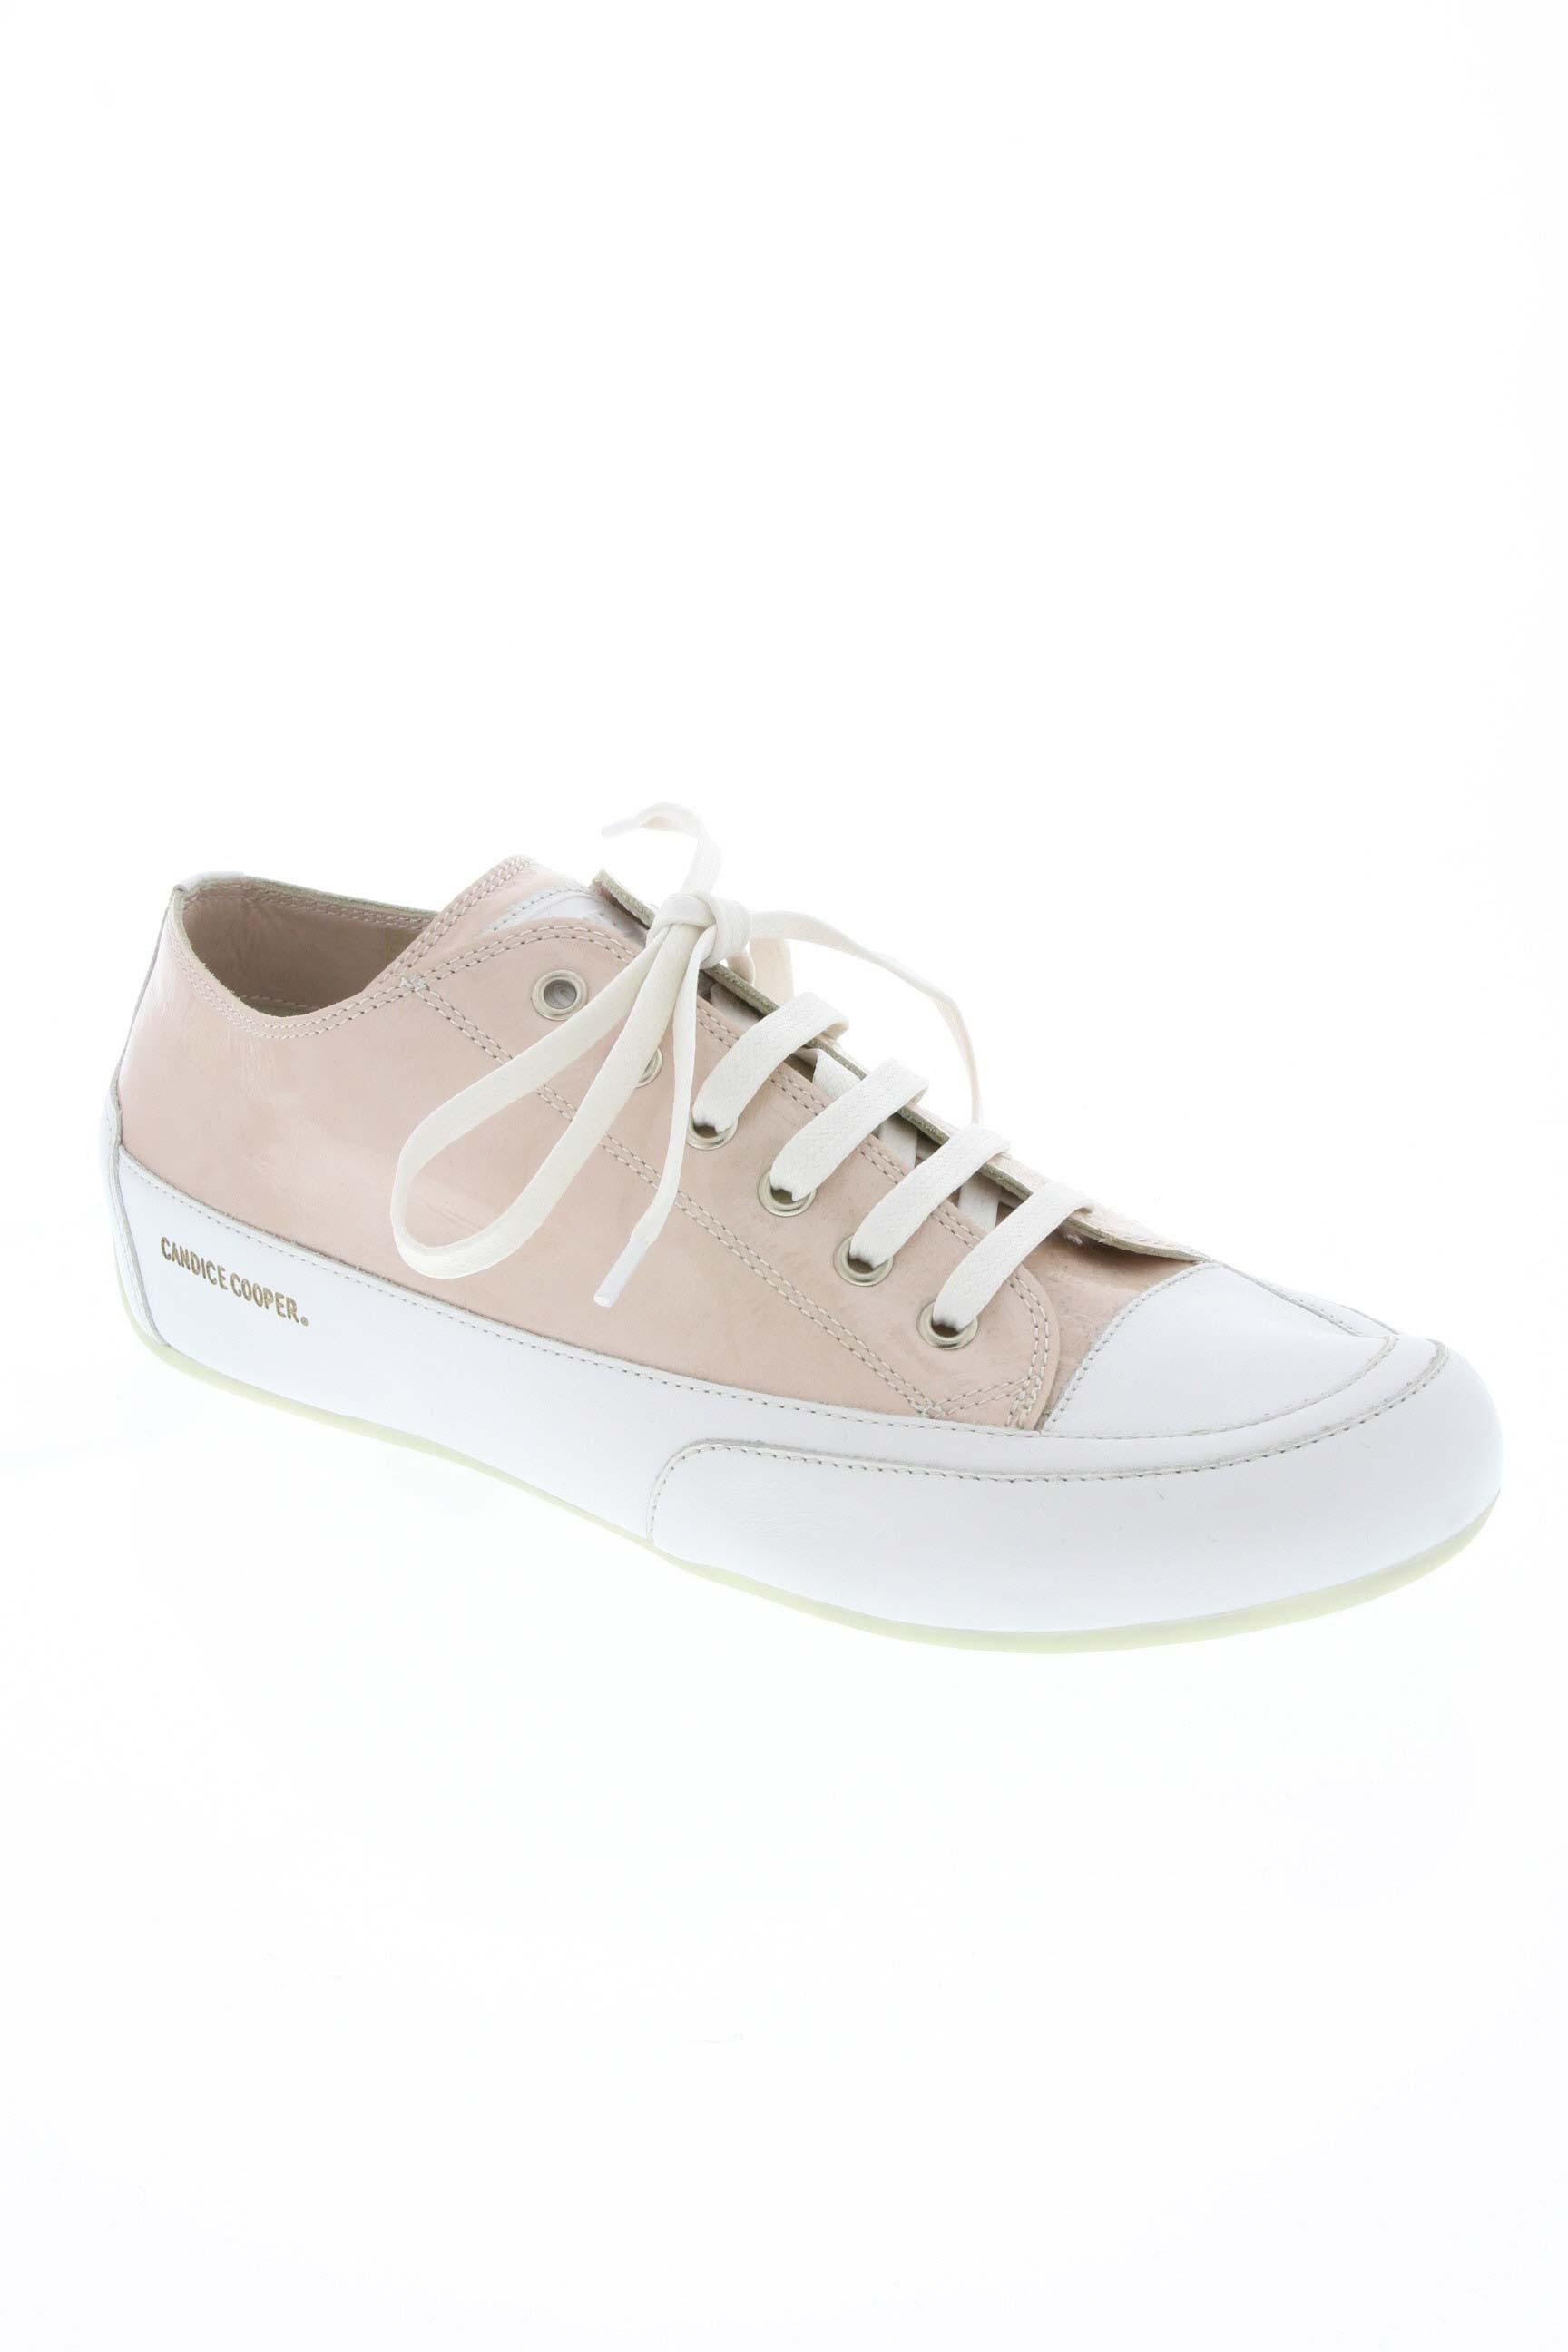 Chaussures Candice Cooper femme | Grand choix de styles